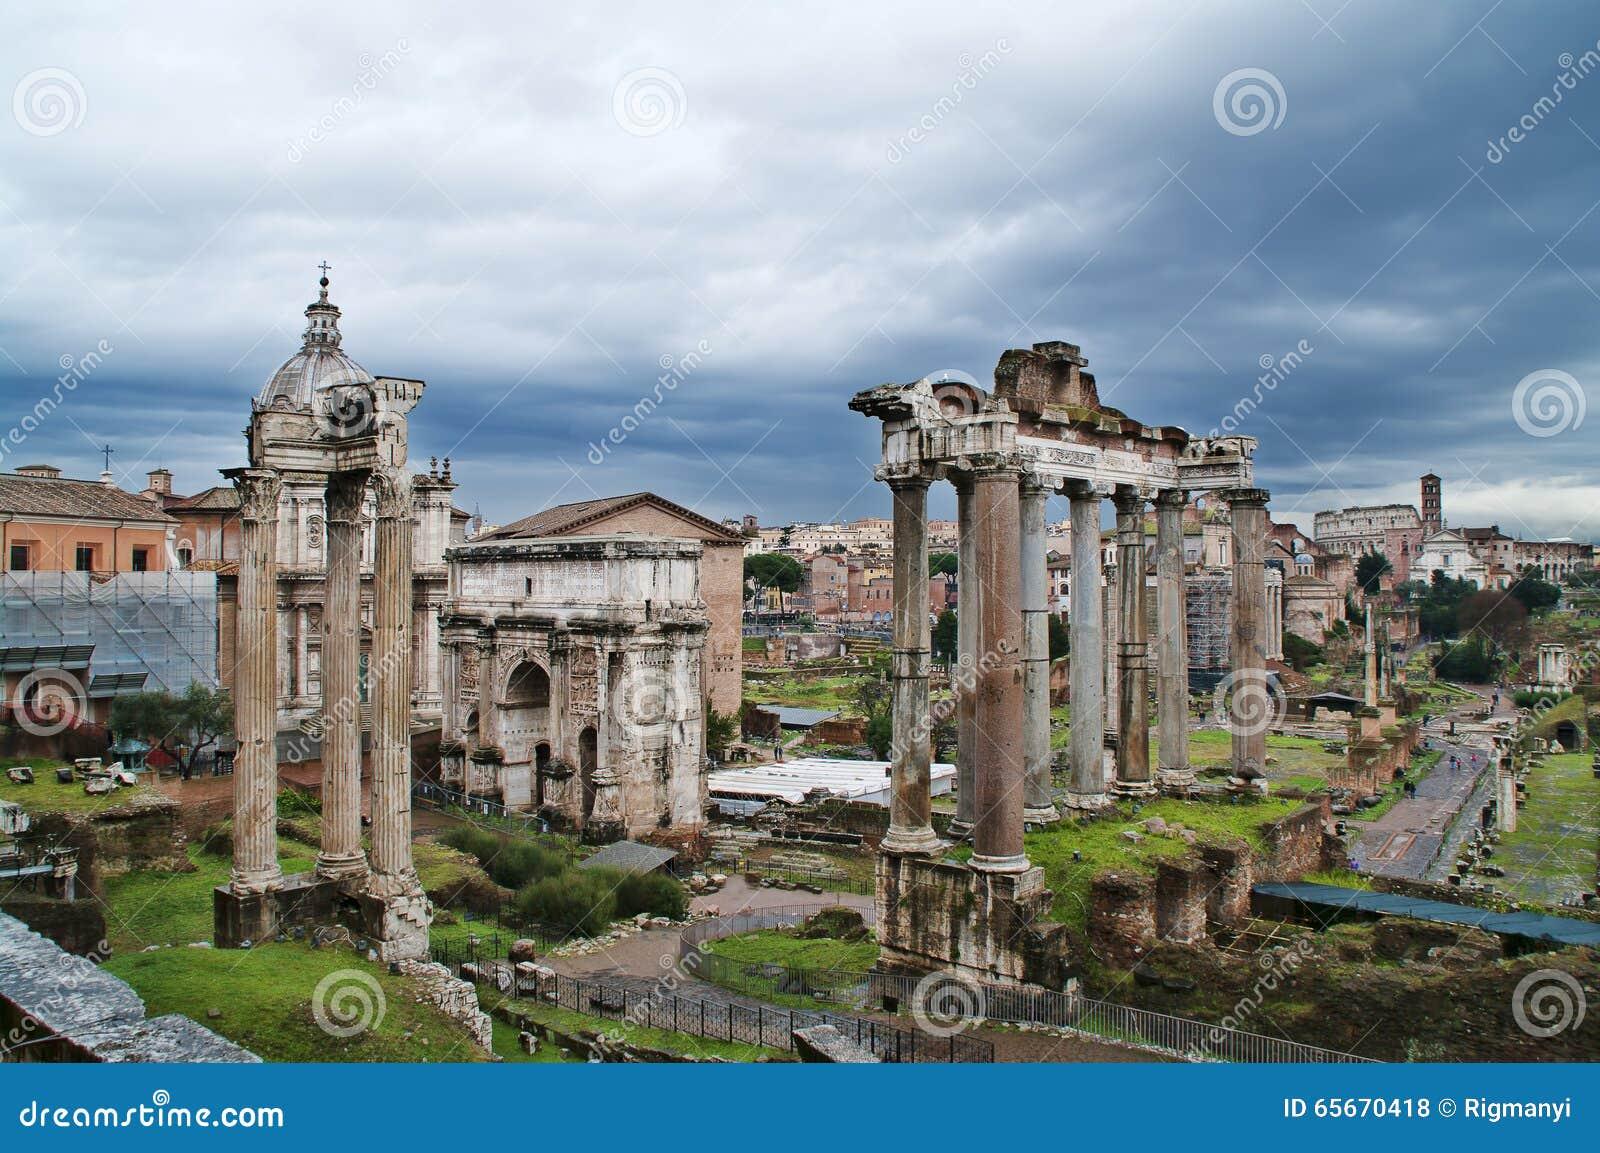 Fórum romano em Roma, Italy